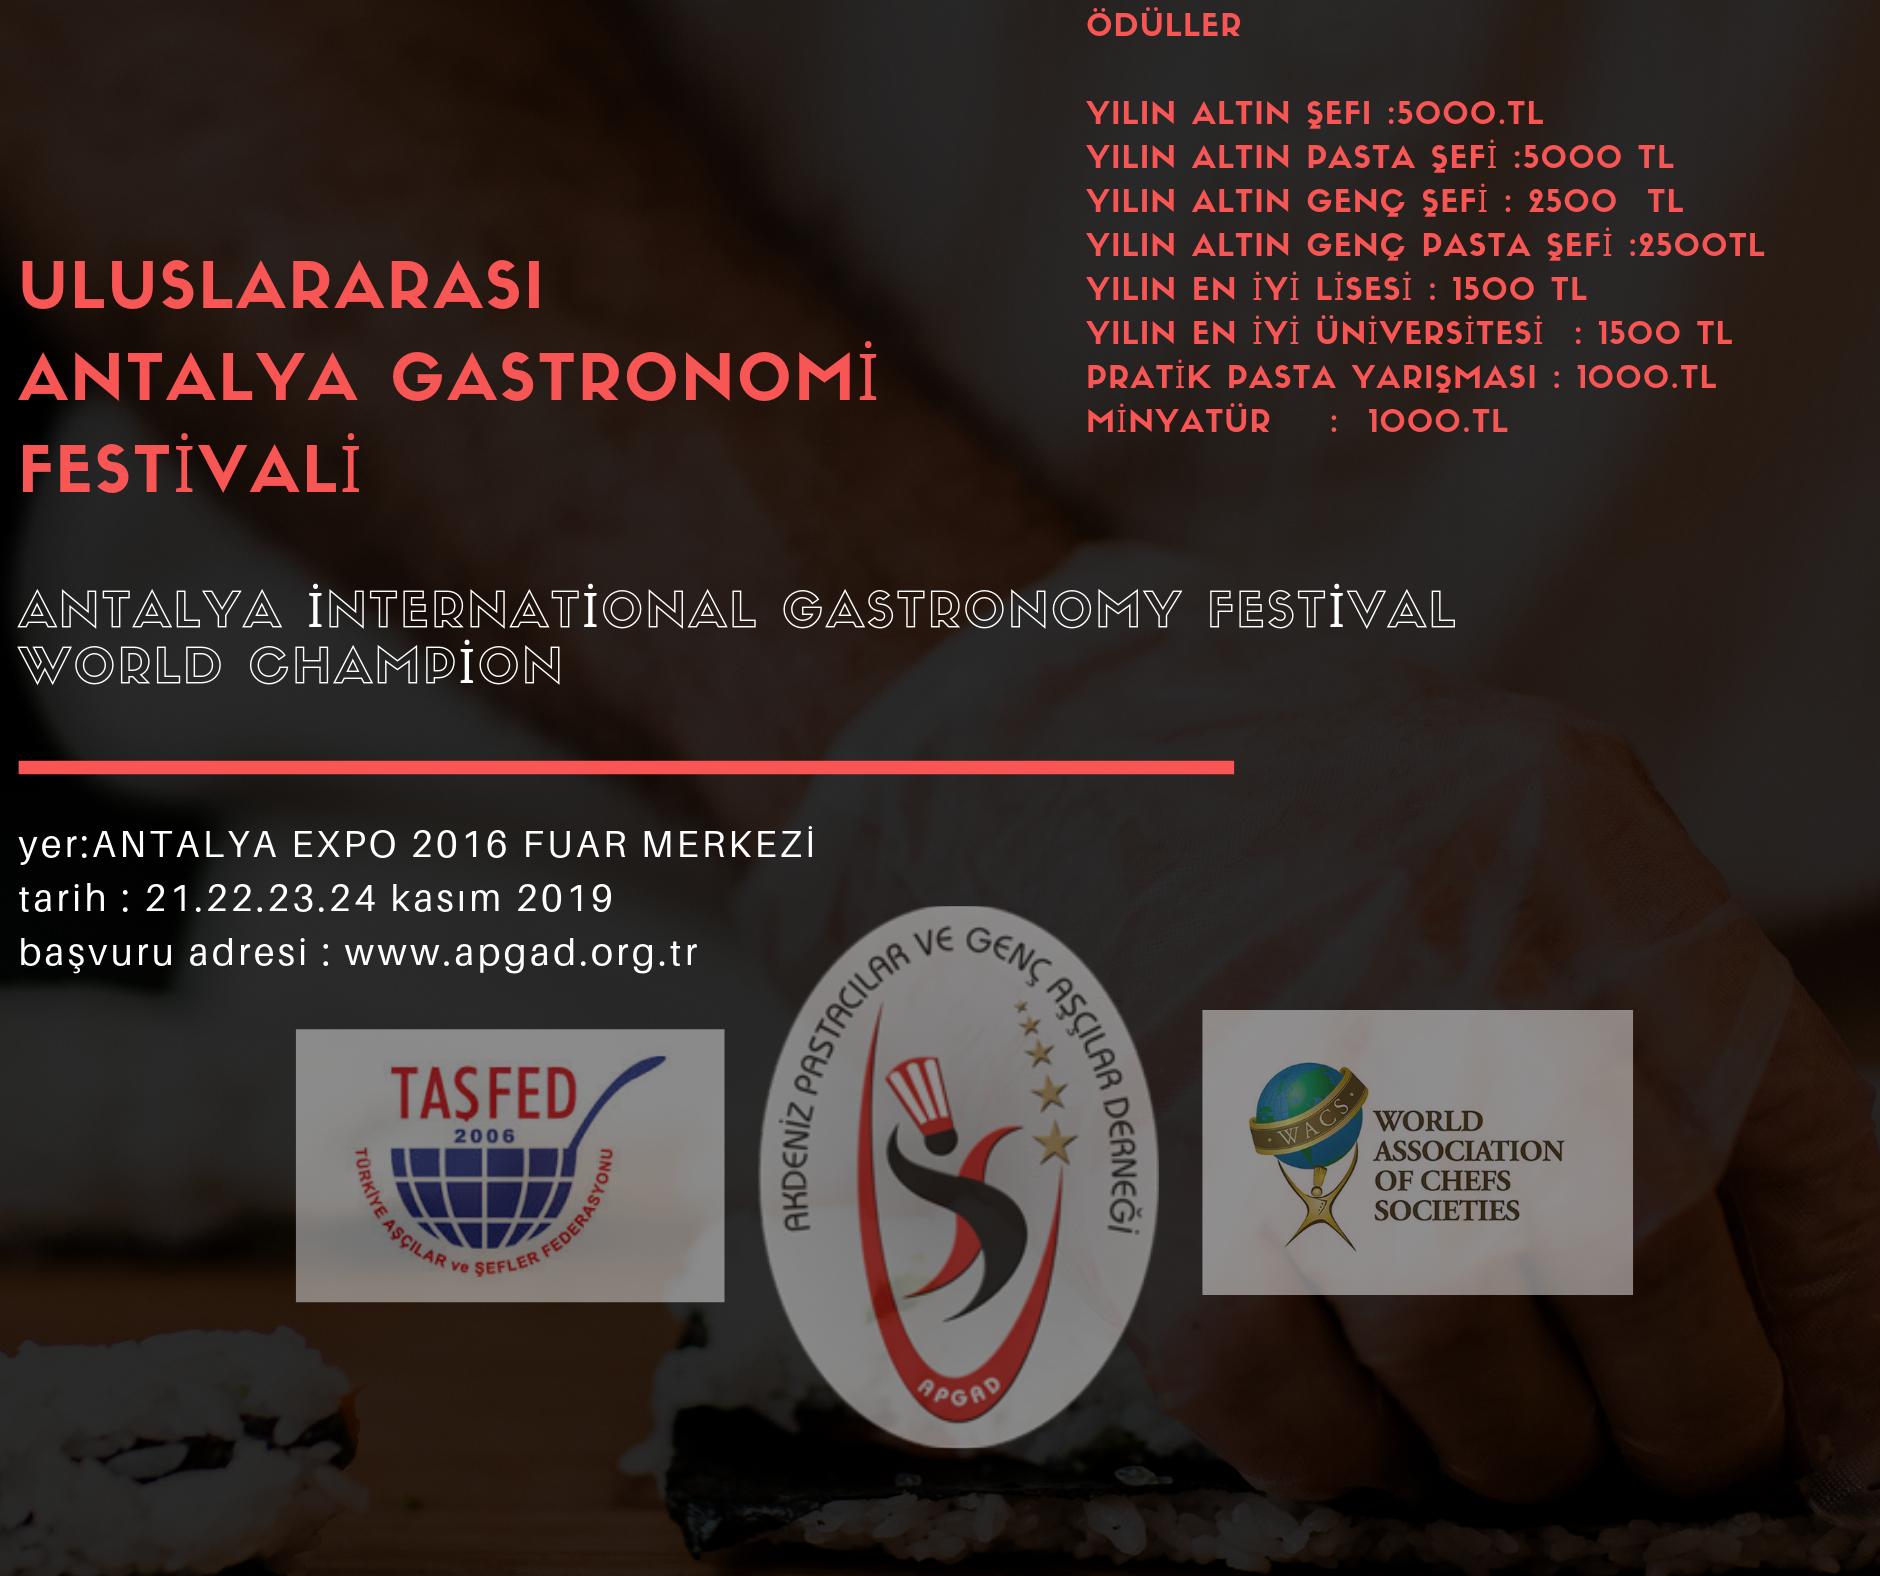 ANTALYA ULUSLARARASI GASTRONOMİ FESTİVALİ :21-24 KASIM 2019